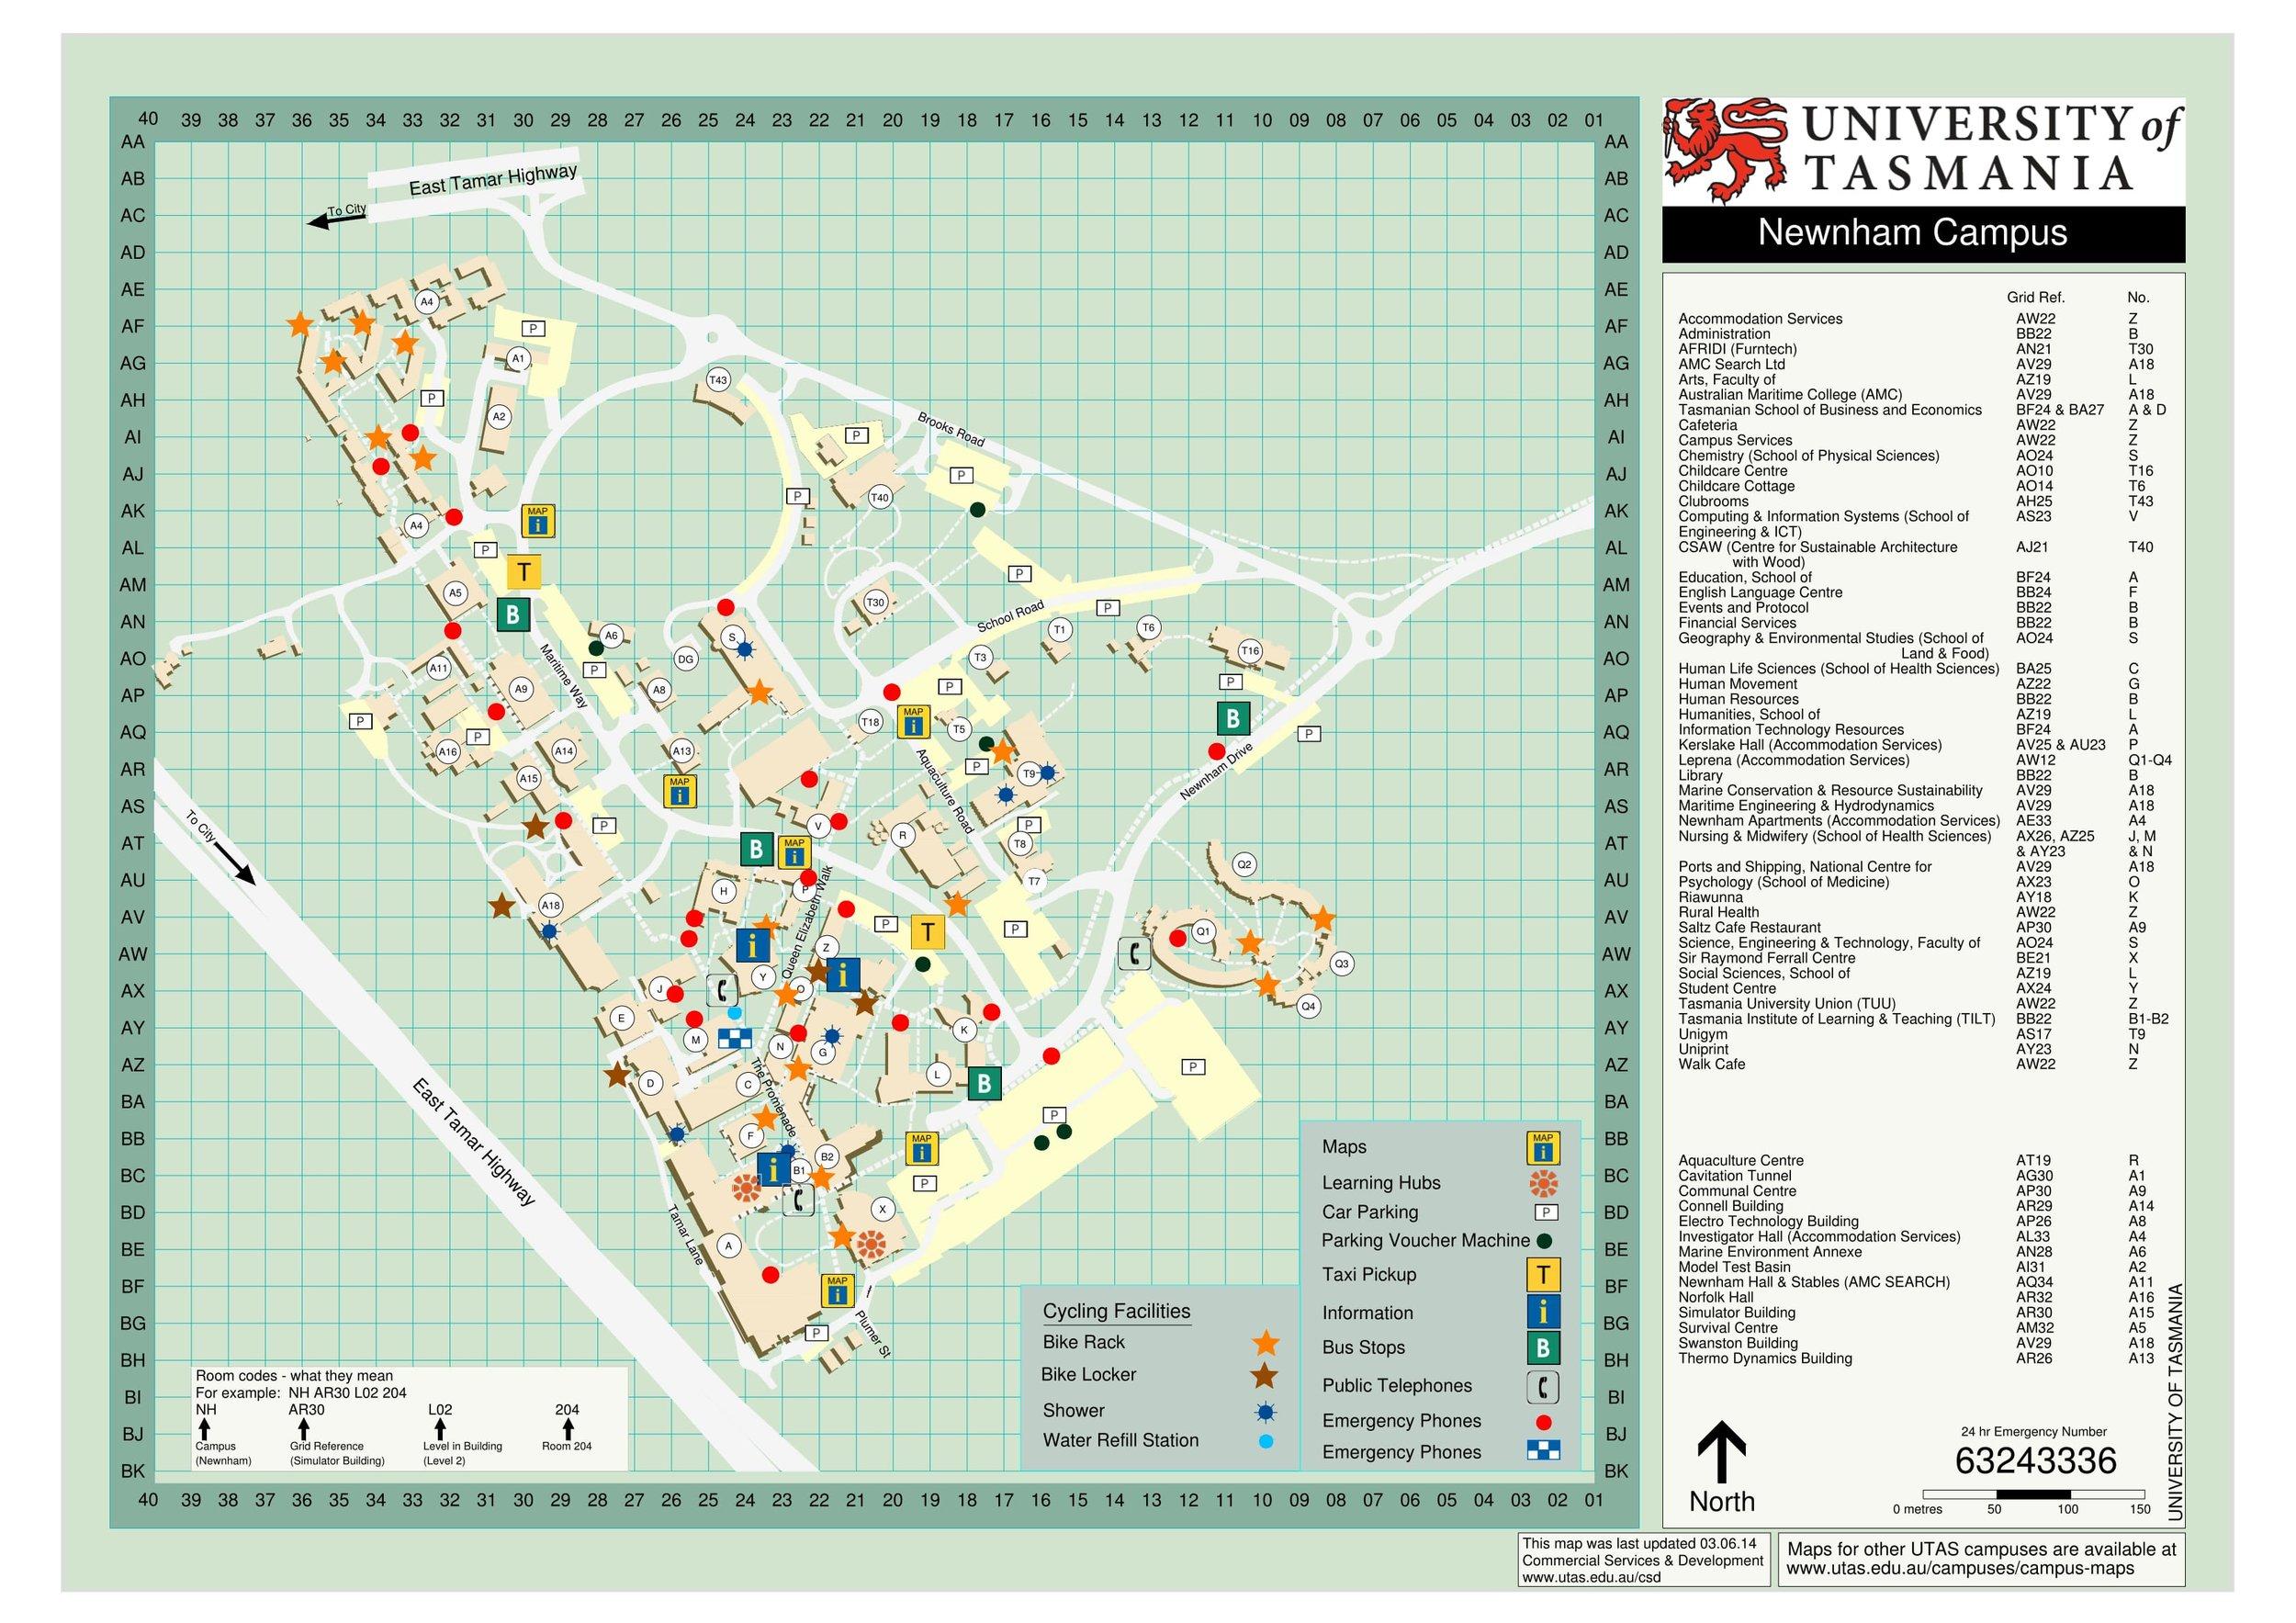 Newnham_Building_Name_Map_June-2014 (1)-1.jpg